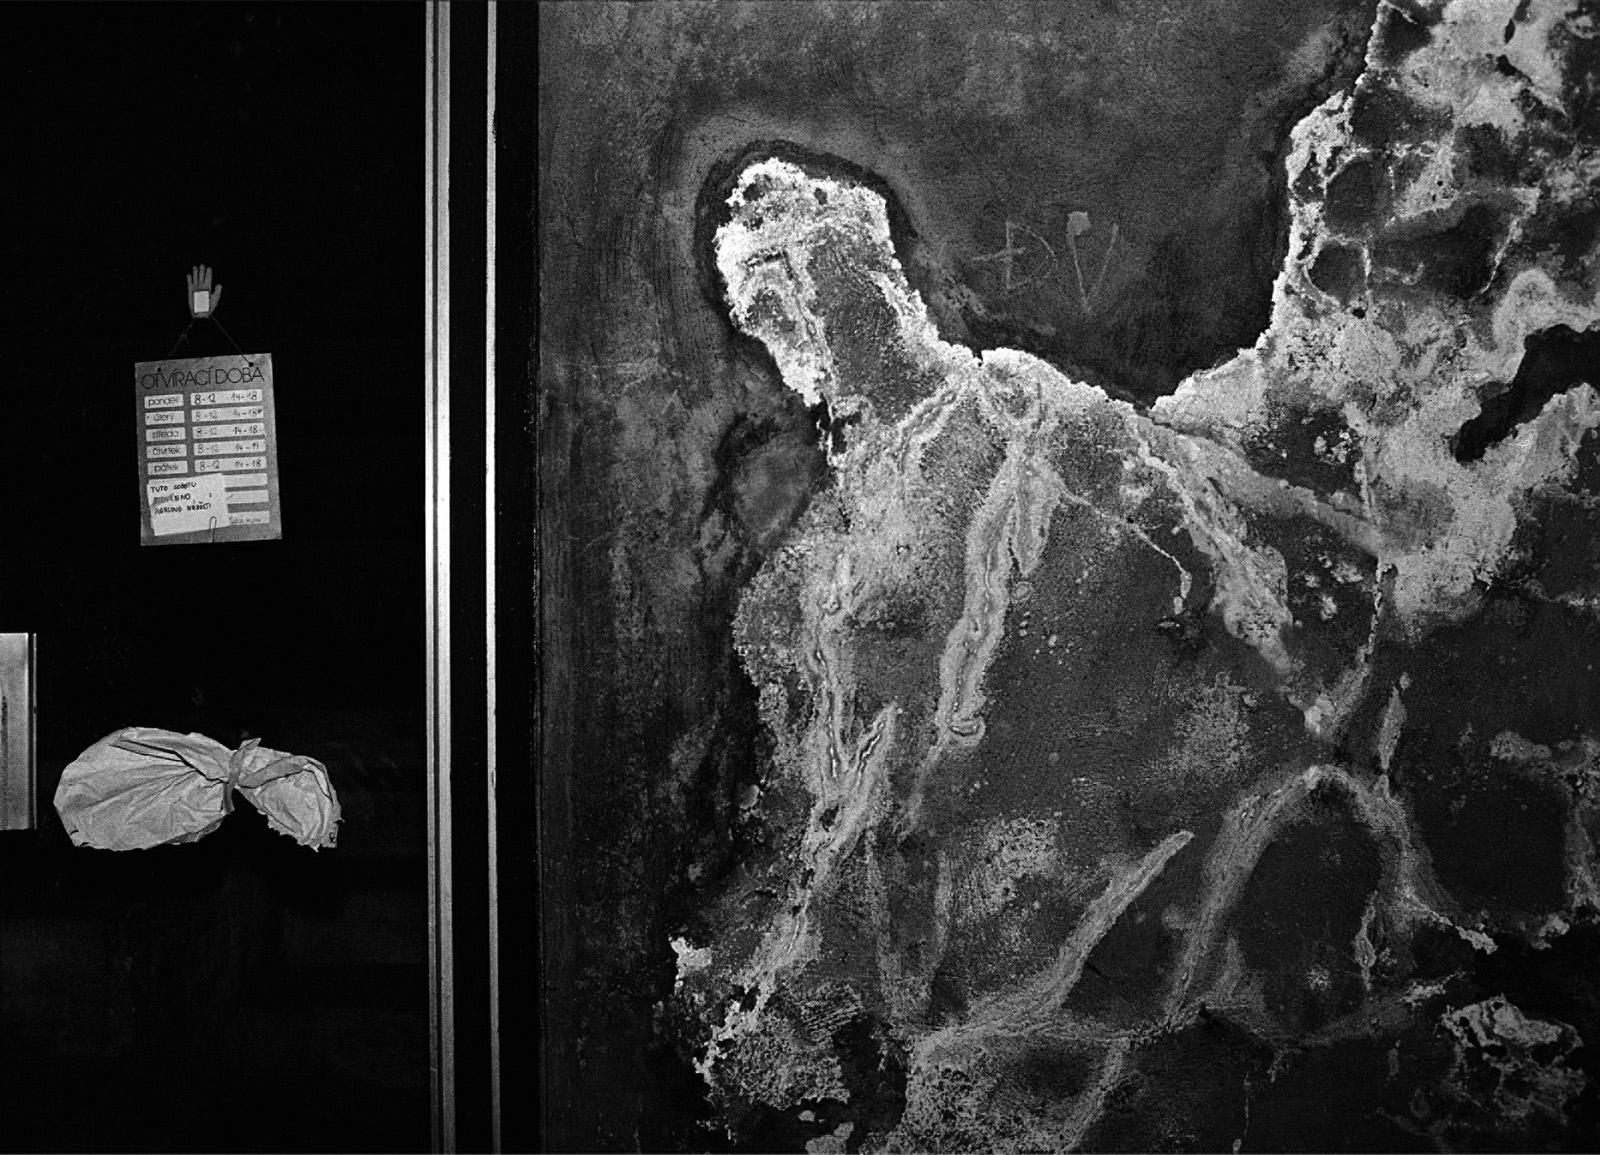 PAMĚTI NOCI – PRAHA 1983 / NIGHT MEMORIES – PRAGUE 1983 © PETER ŽUPNÍK: Duch doby / Ghost of Time